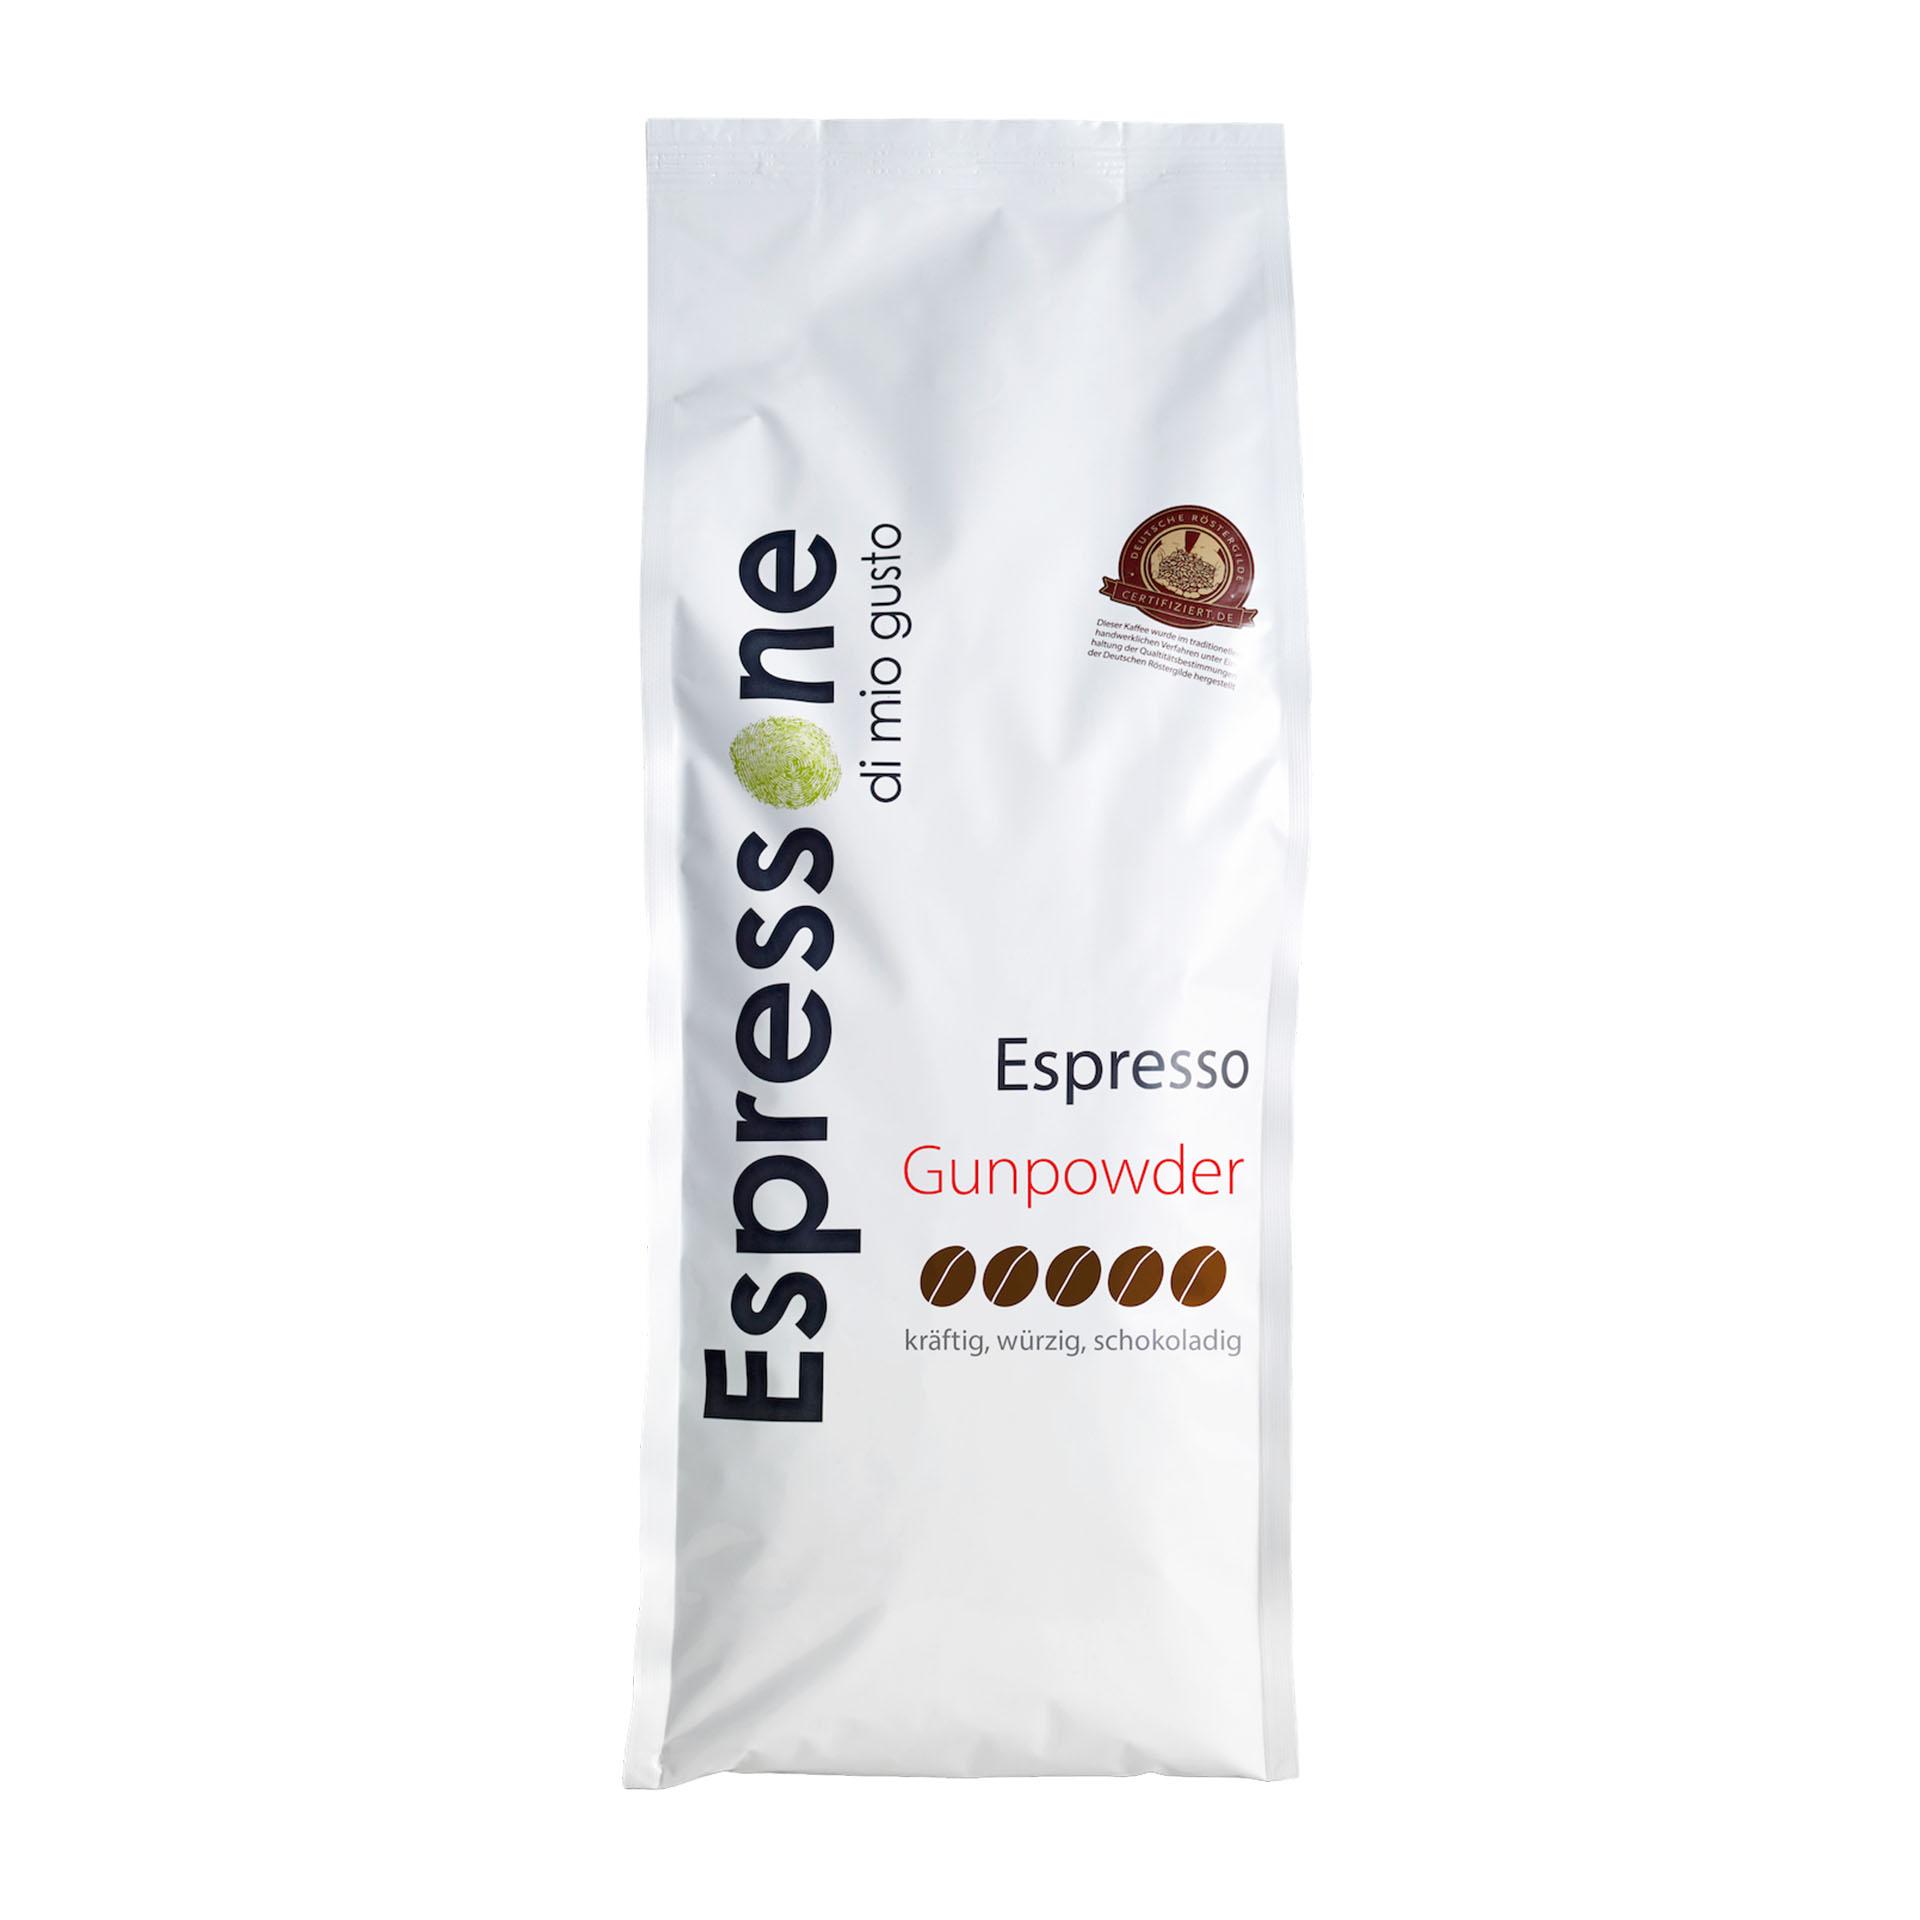 Espressone Gunpowder - 1kg